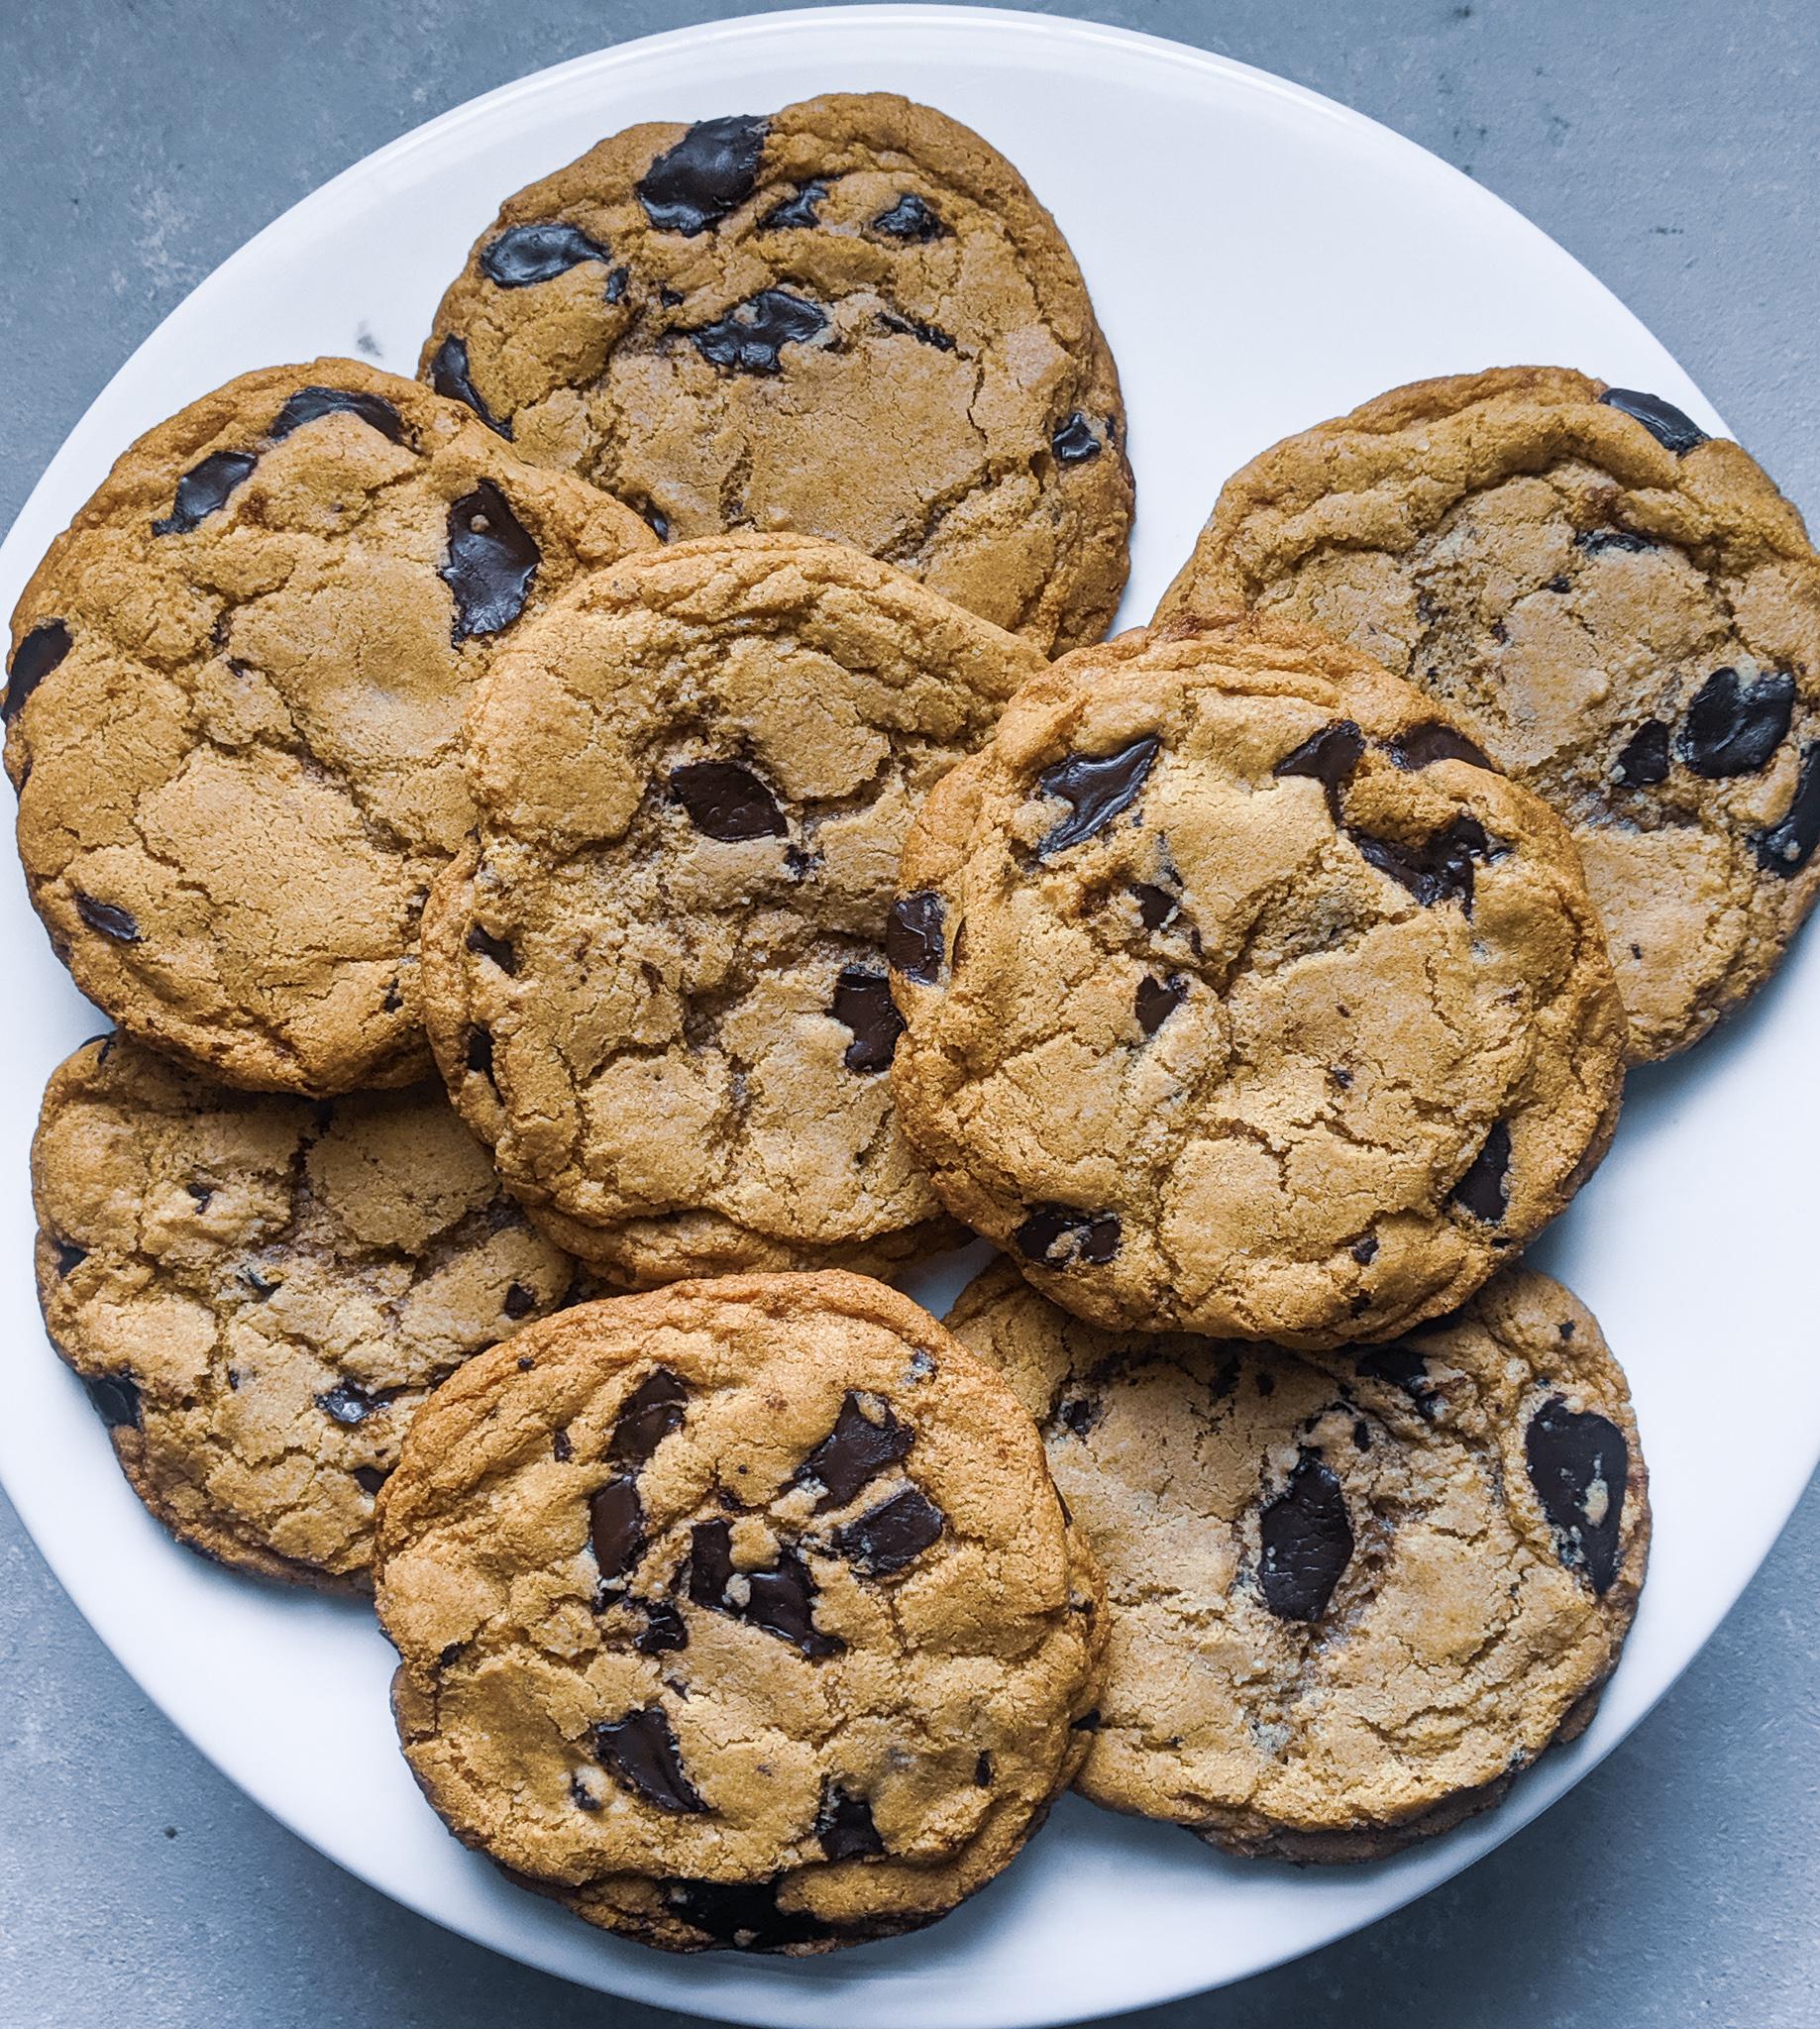 Soft & Crispy Gluten Free Chocolate Chip Cookie